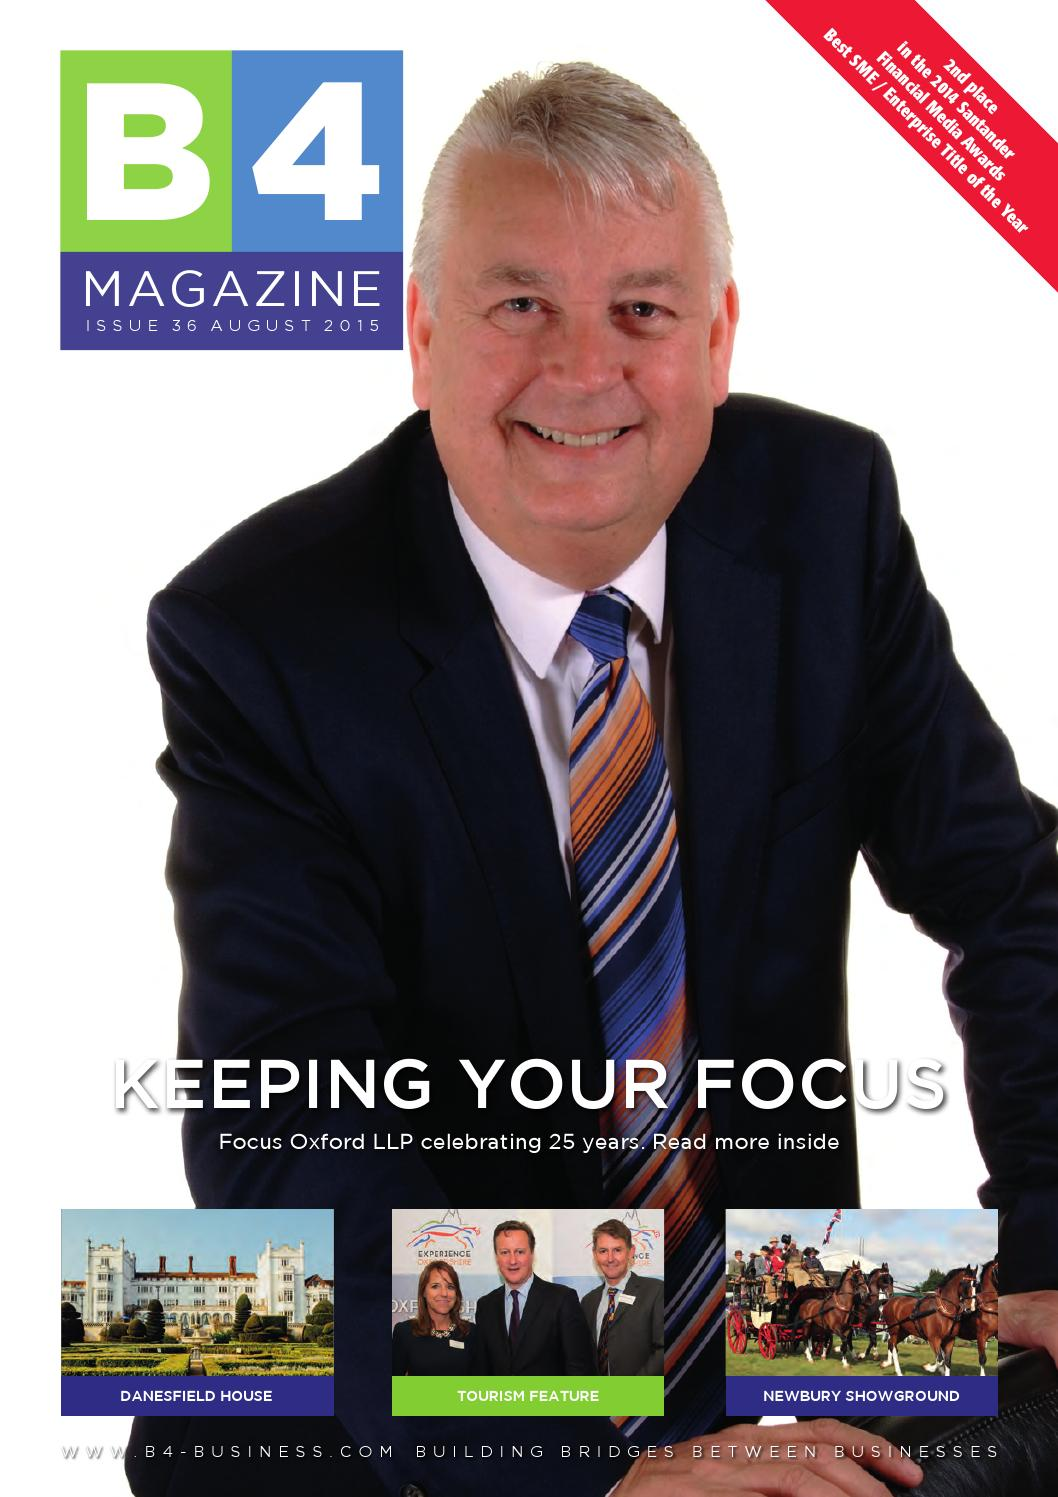 Issue B4 Magazine by issuu B4 36 KuJ5lc3TF1